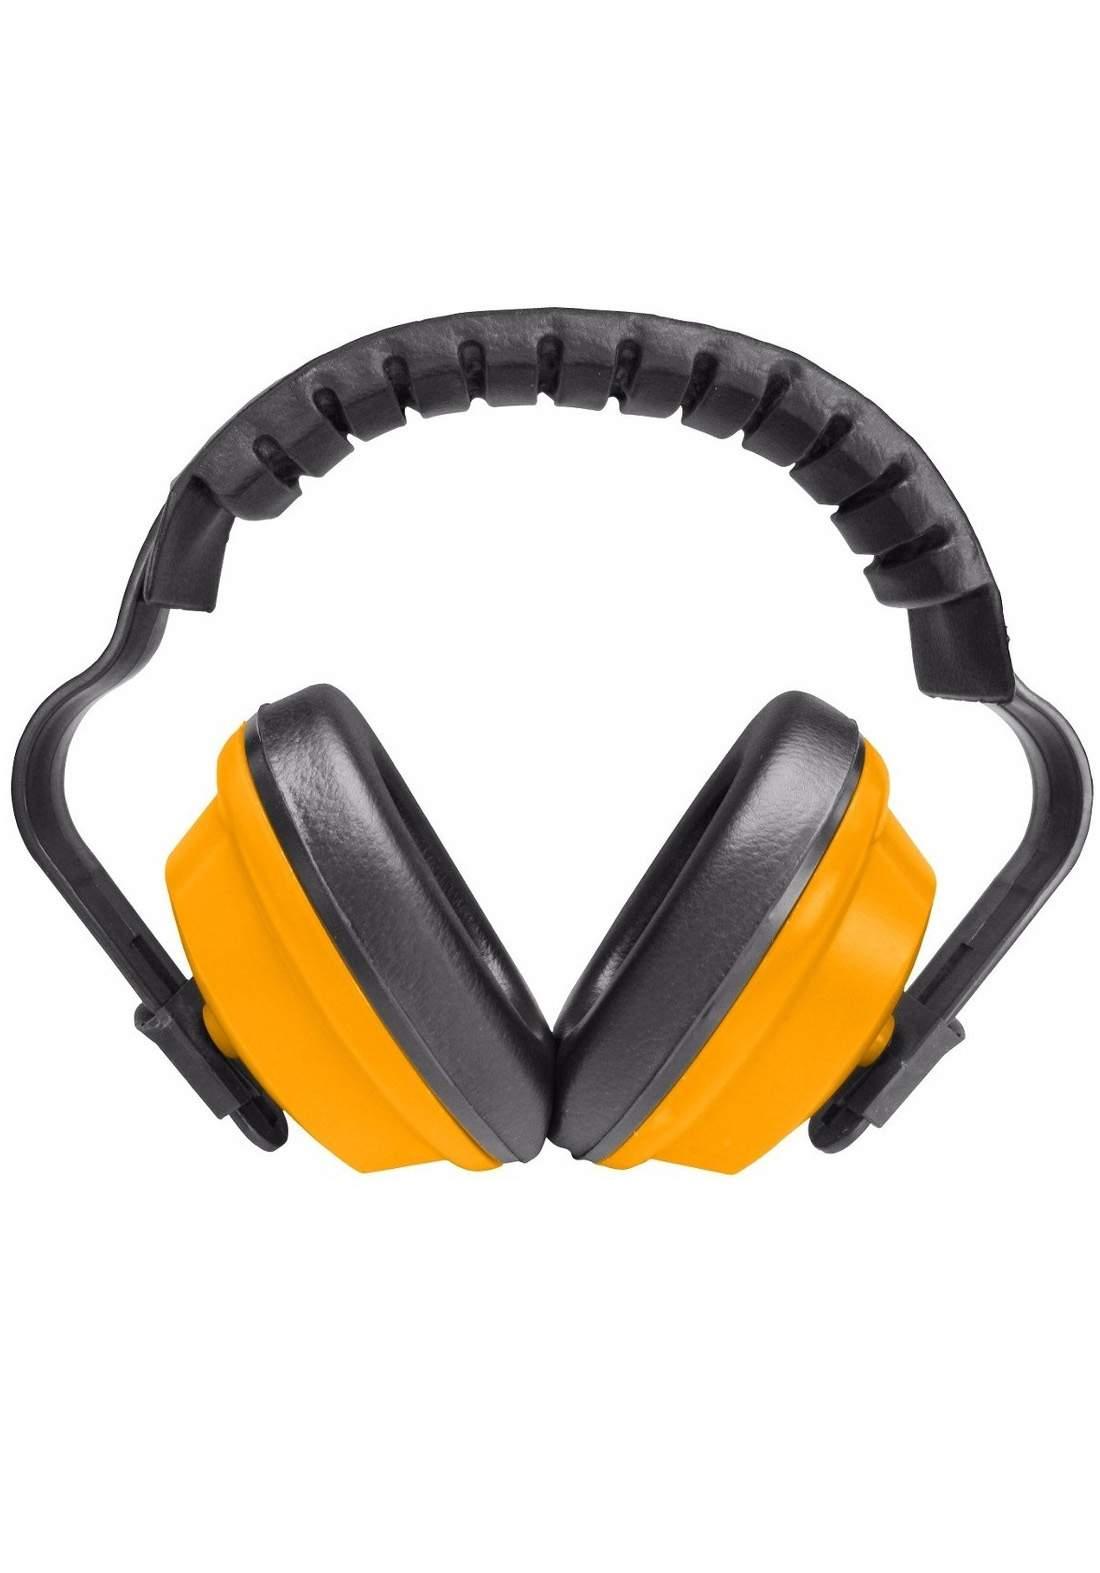 Ingco - hem01  Ear Muff  غطاء حماية الاذن